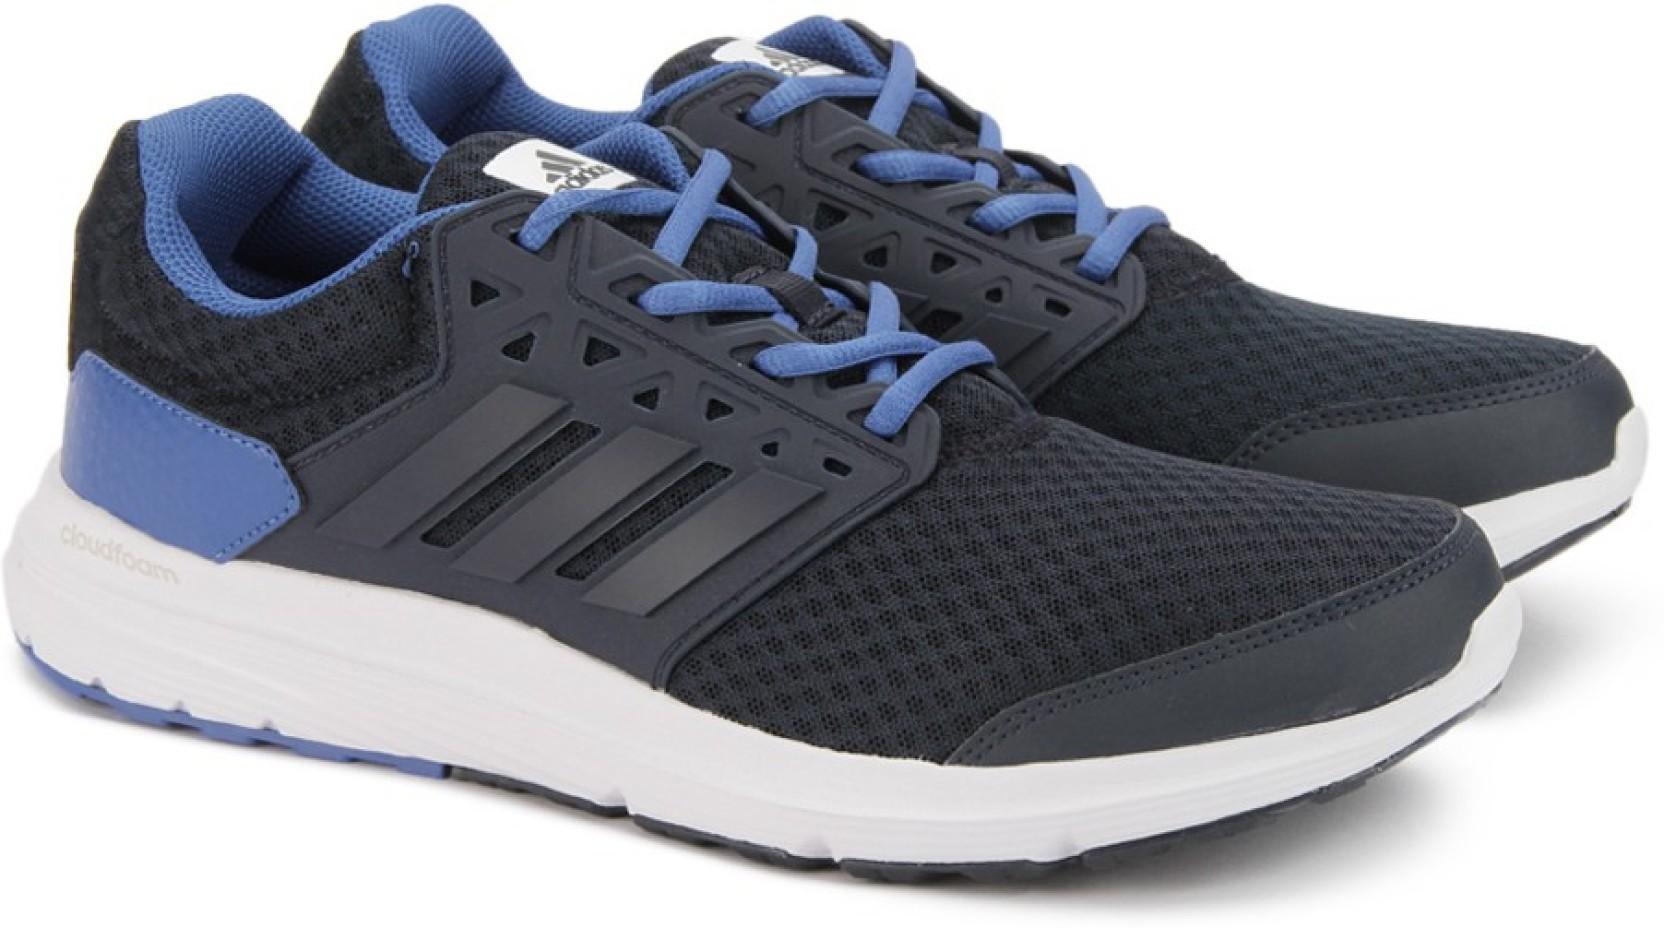 ADIDAS GALAXY 3 M Running Shoes For Men - Buy CONAVY CONAVY BLUE ... 35145839d